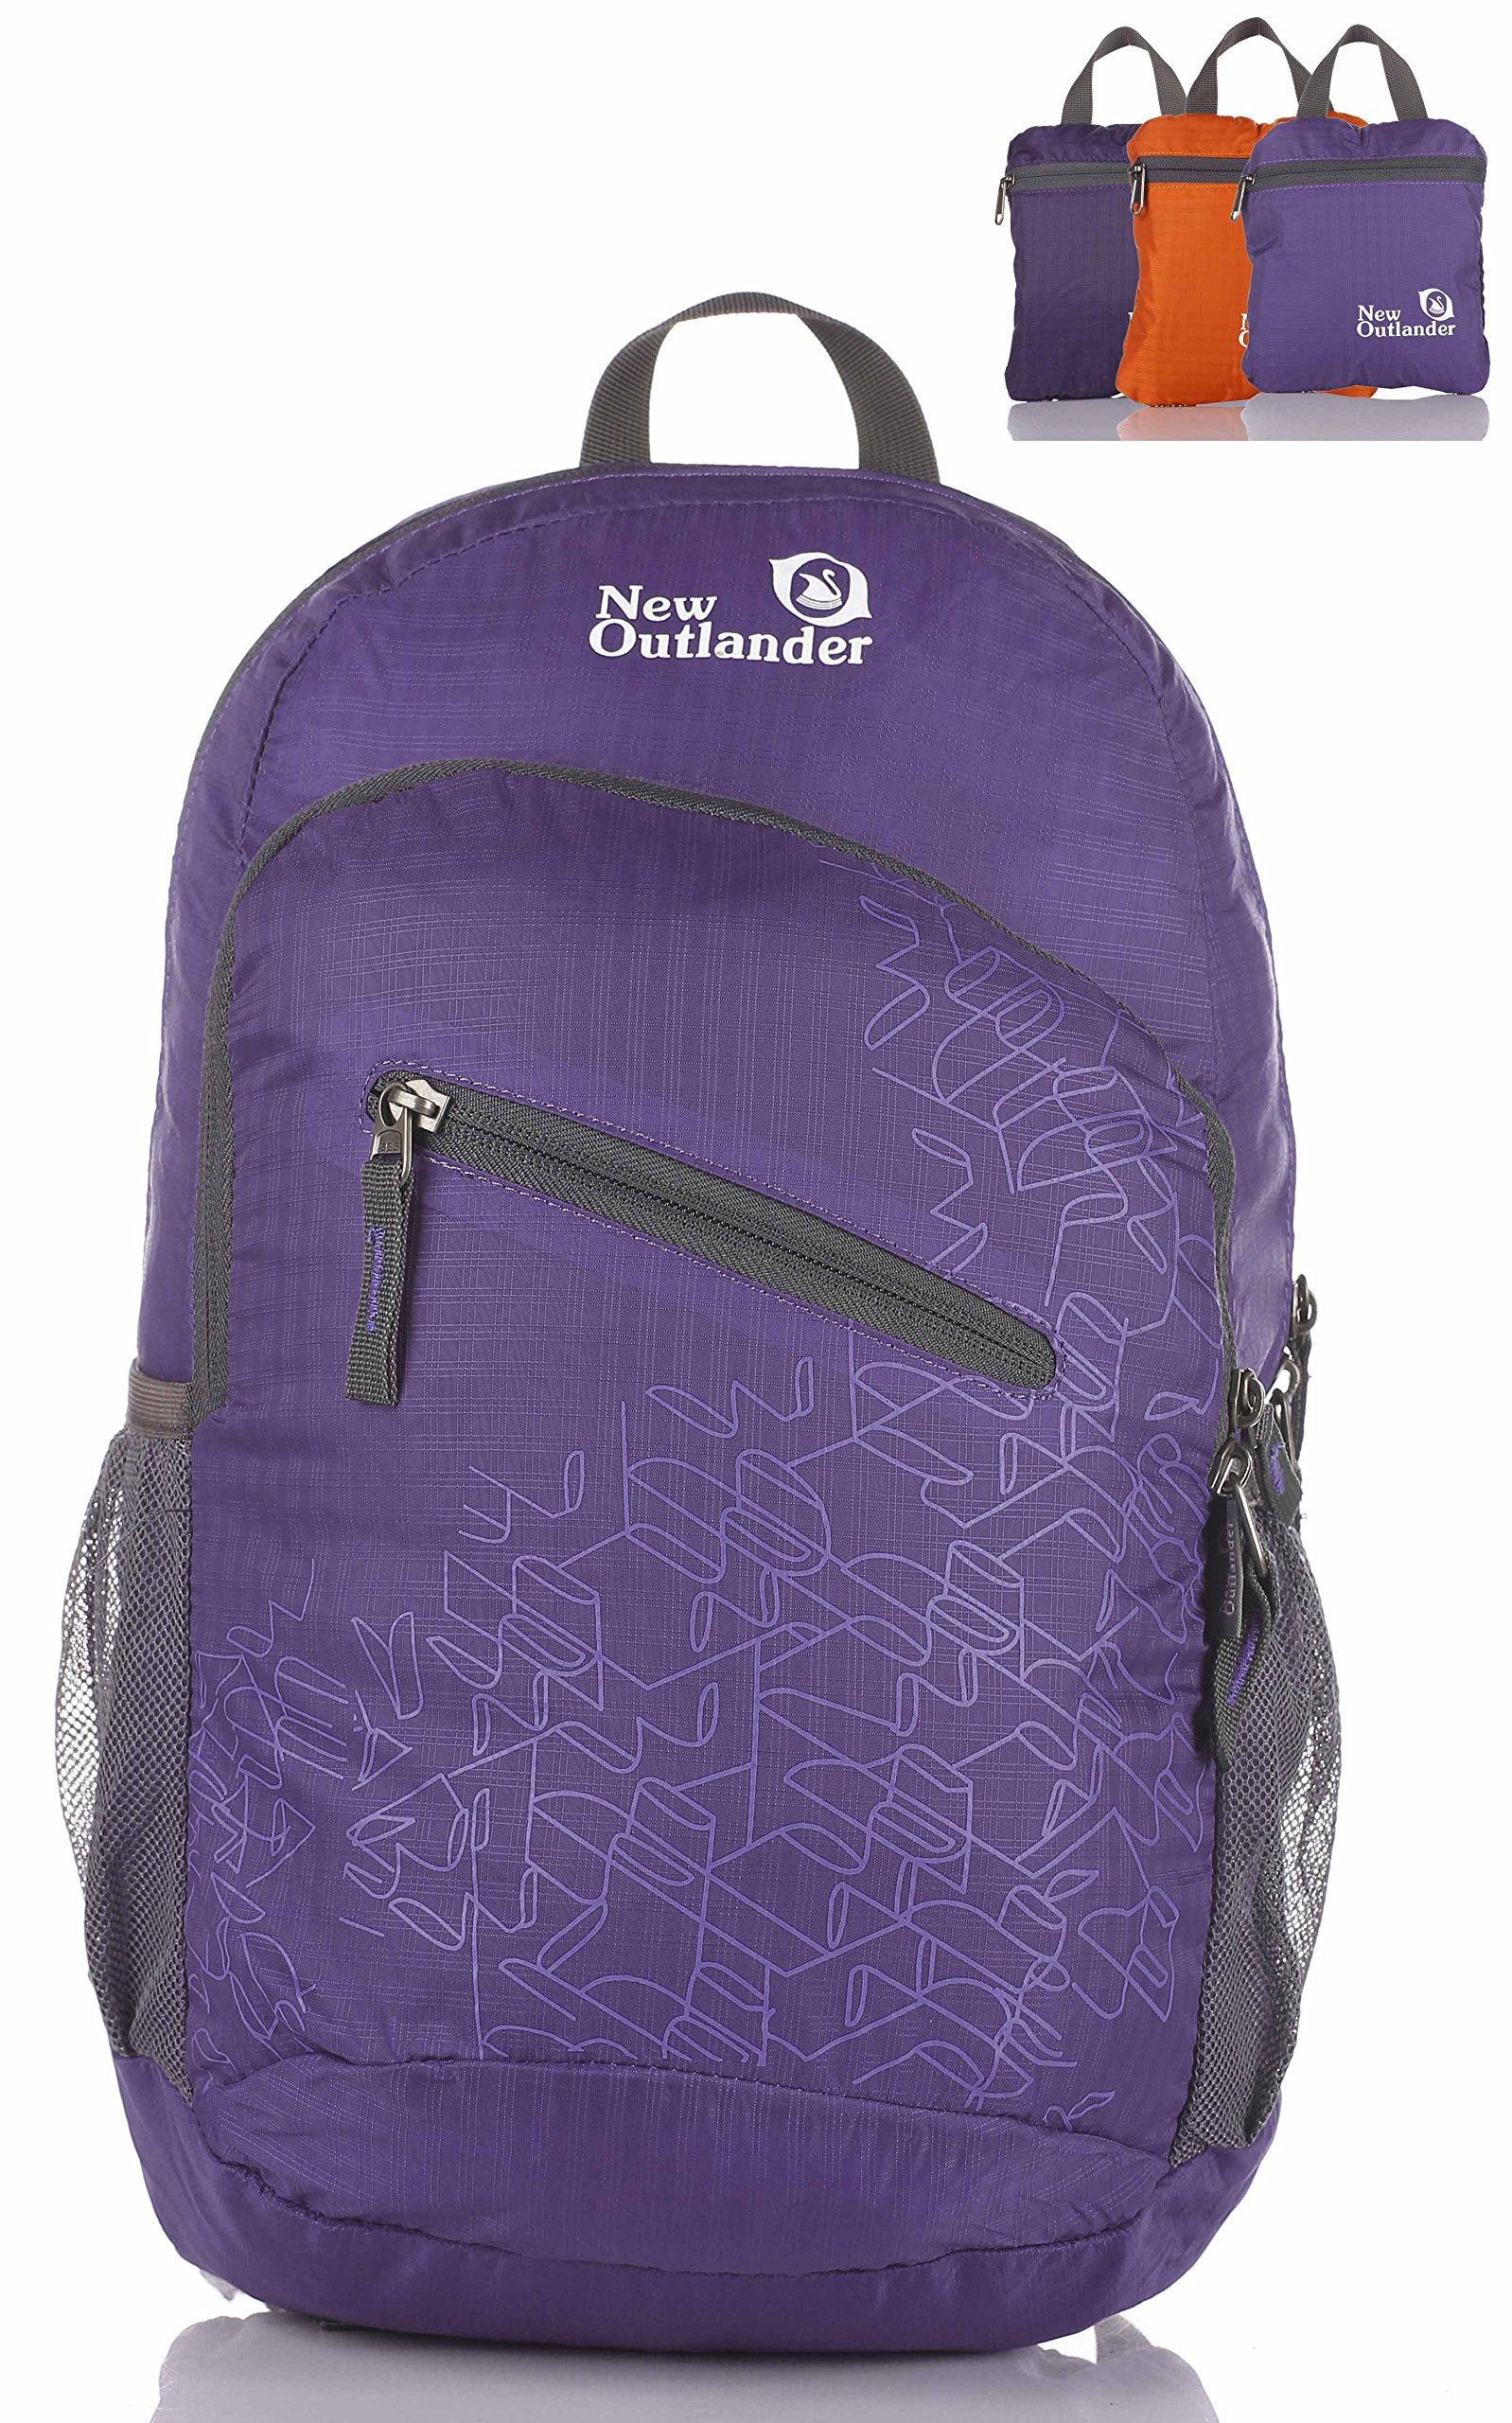 Outlander Packable Handy Lightweight Travel Hiking Backpack Daypack-Purple-L by Outlander (Image #1)